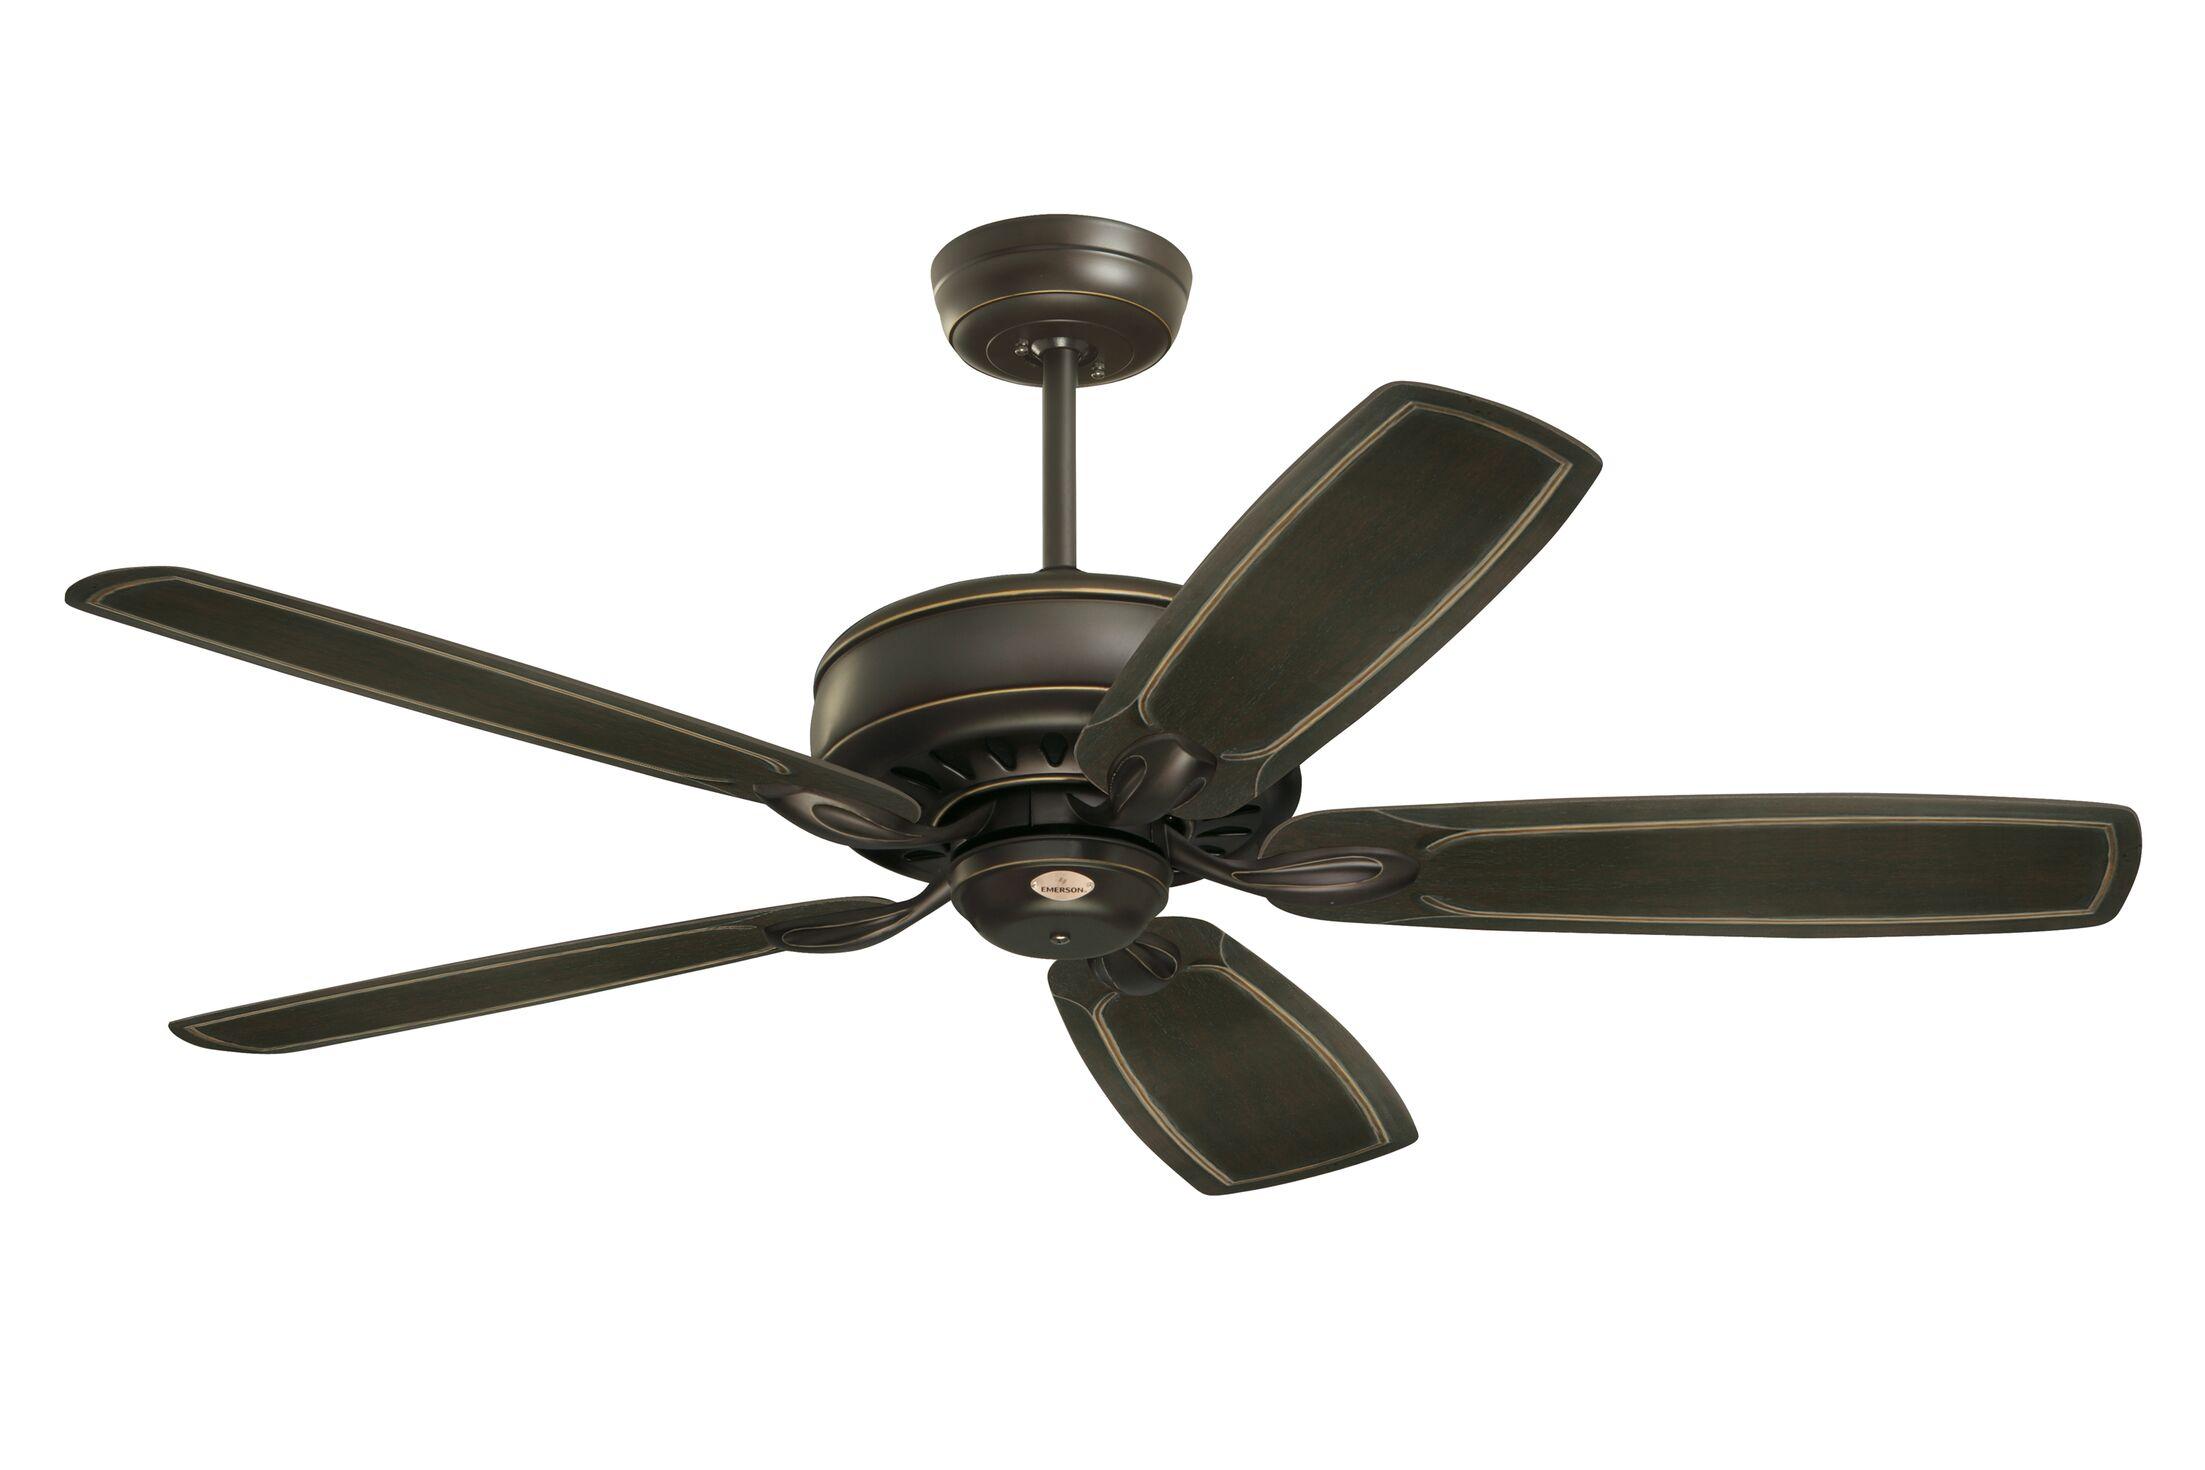 Huemiller 5 Blade Ceiling Fan with Remote Blade Finish: Golden Espresso, Housing Finish: Golden Espresso